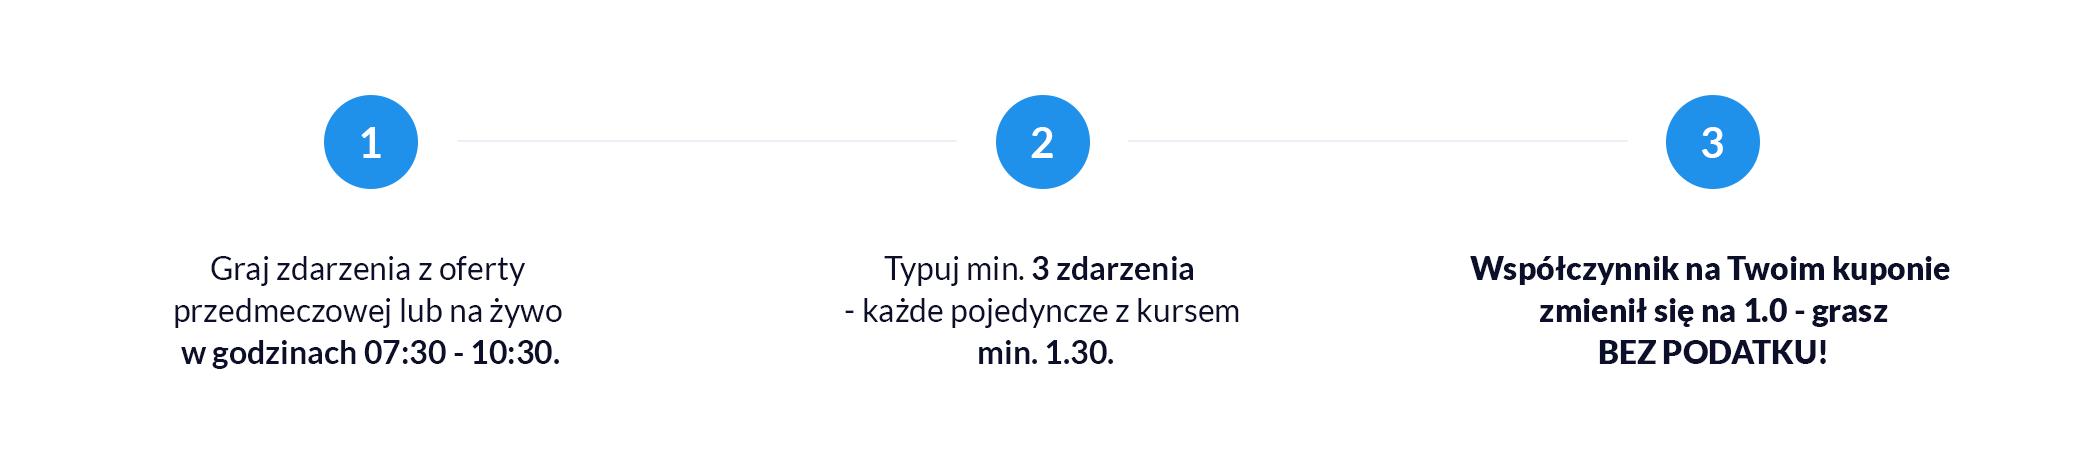 sniadanie_3punkty_desktop.png